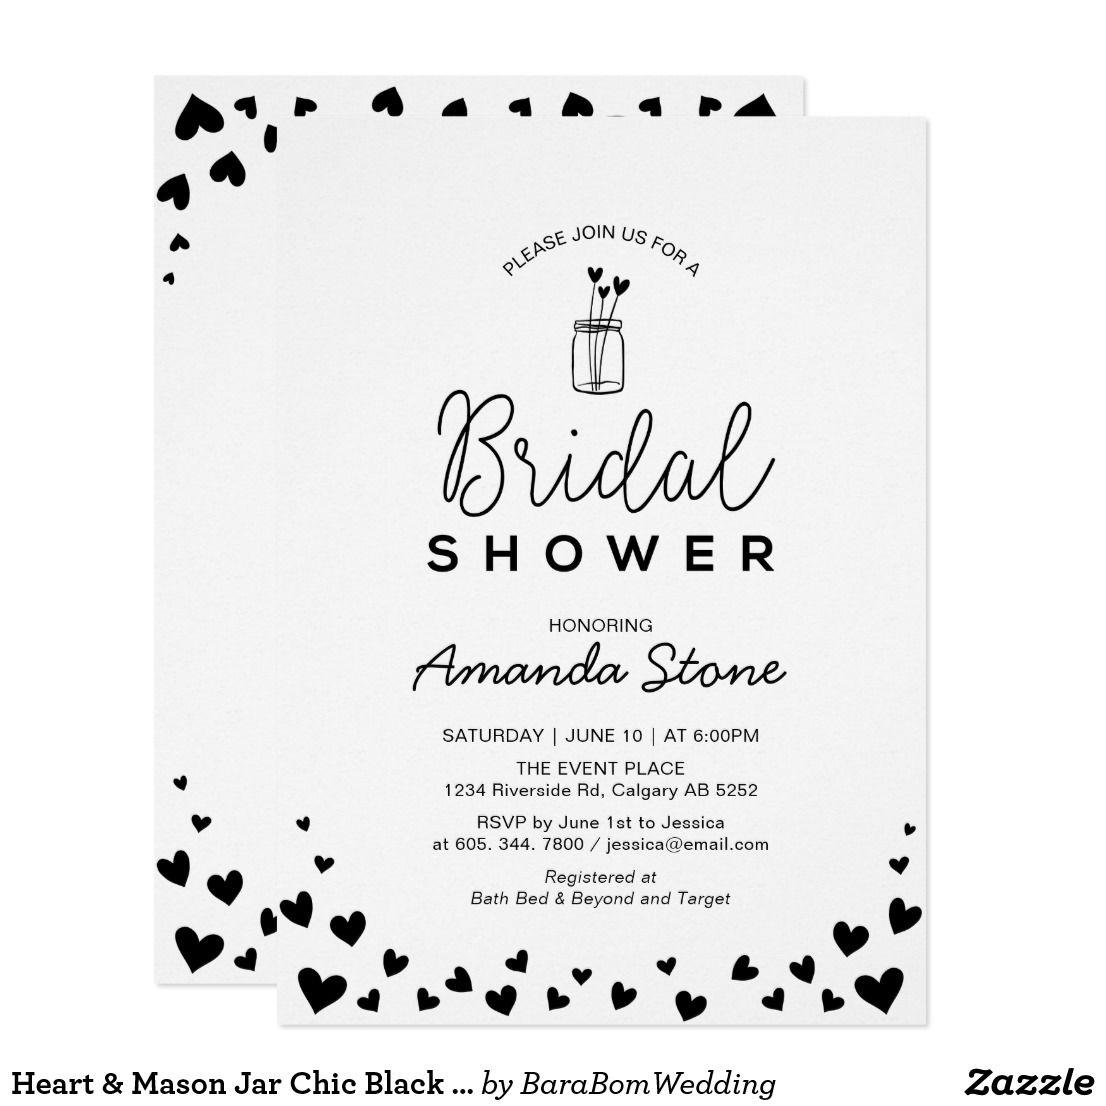 Heart & Mason Jar Chic Black Bridal Shower Card Celebrate your ...